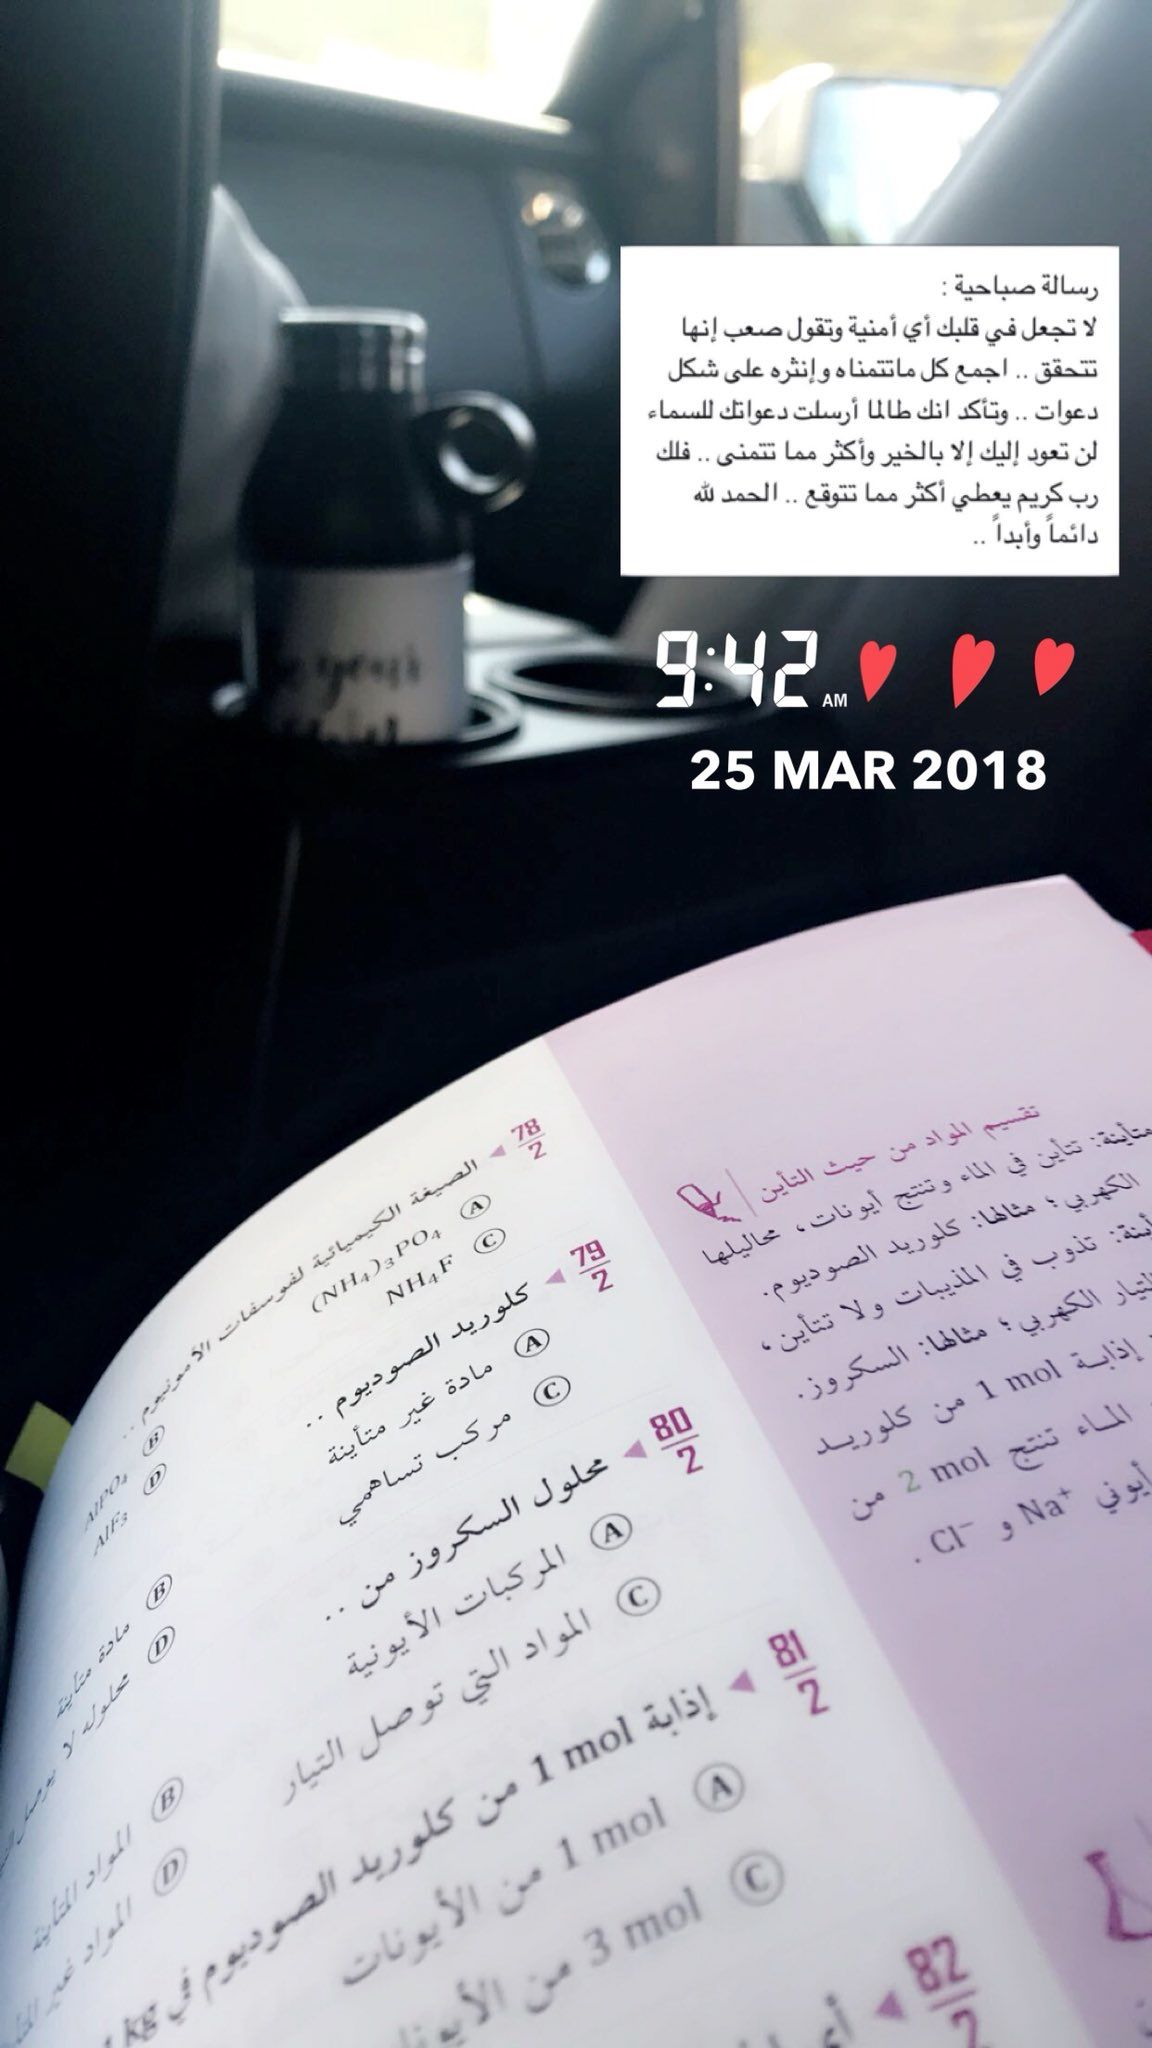 Pin By Sara B On كلام الدنيا Mars 2018 Mar 25th